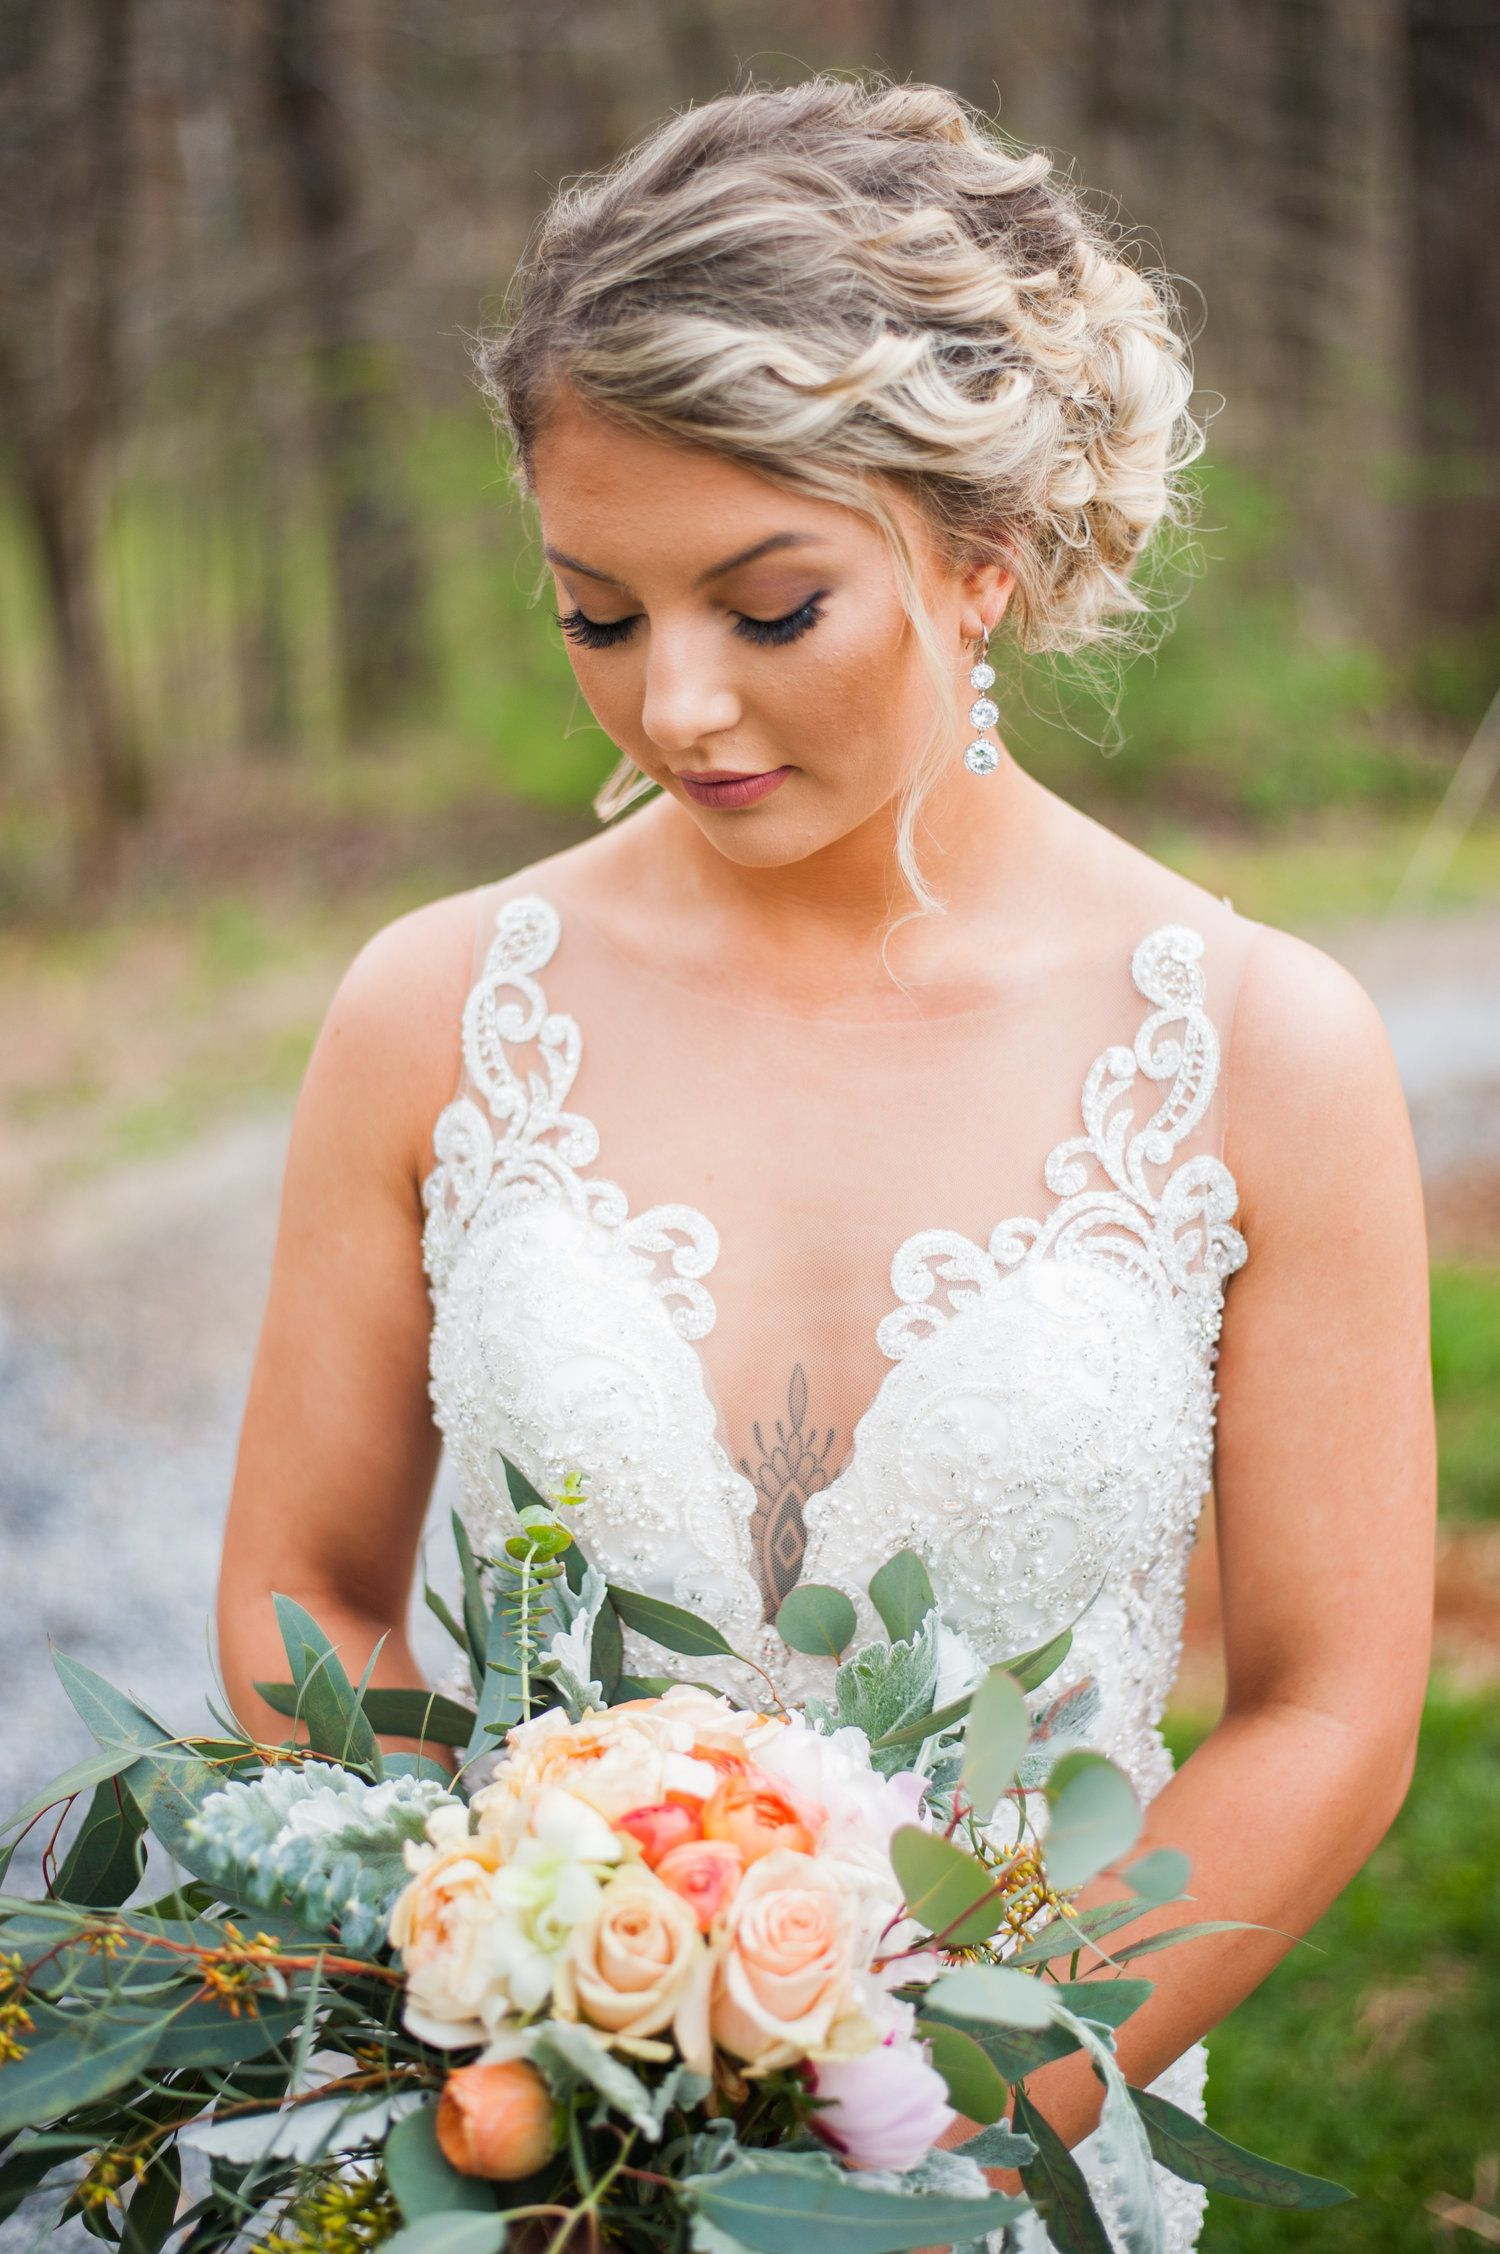 North Georgia Wedding Venue in 2020 | North georgia ...